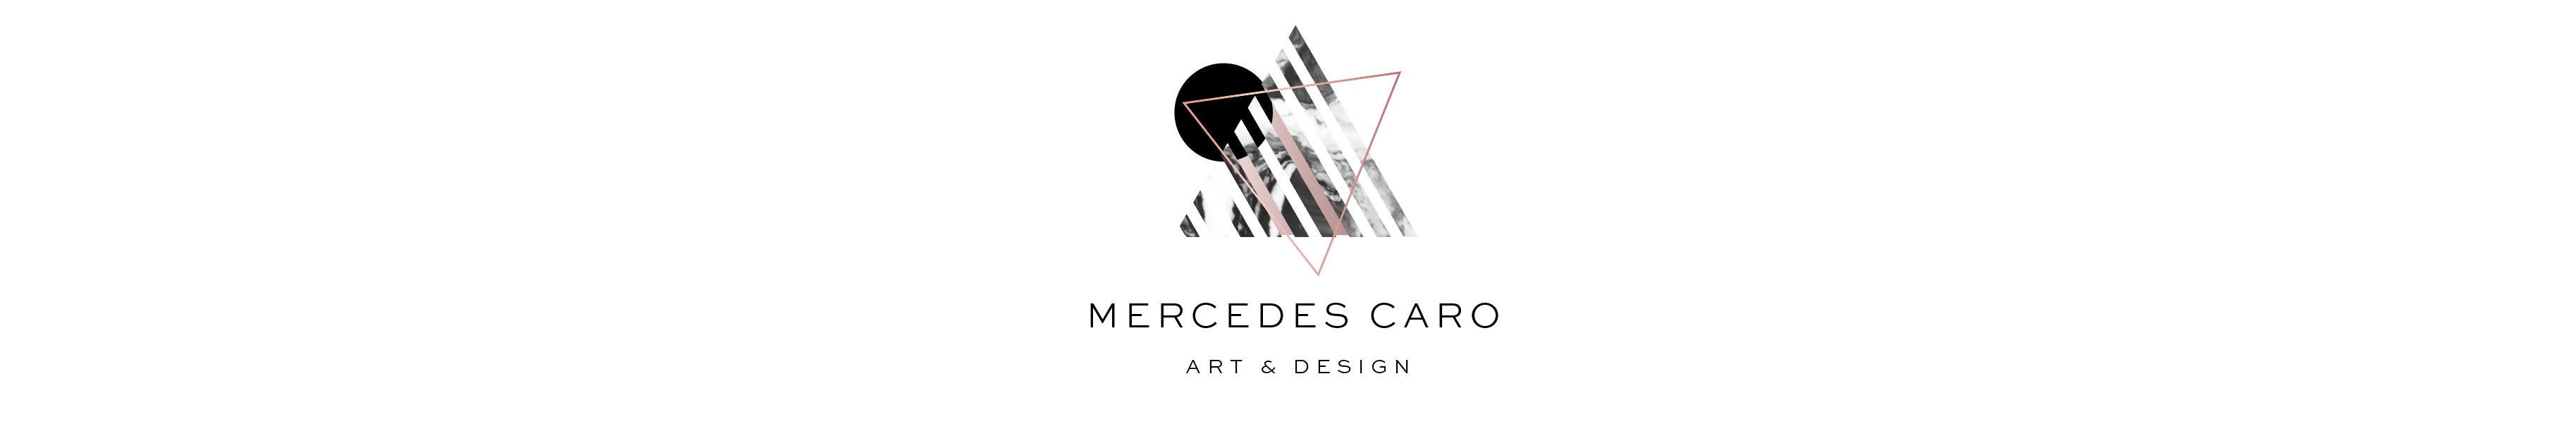 Mercedes Caro Art & Design